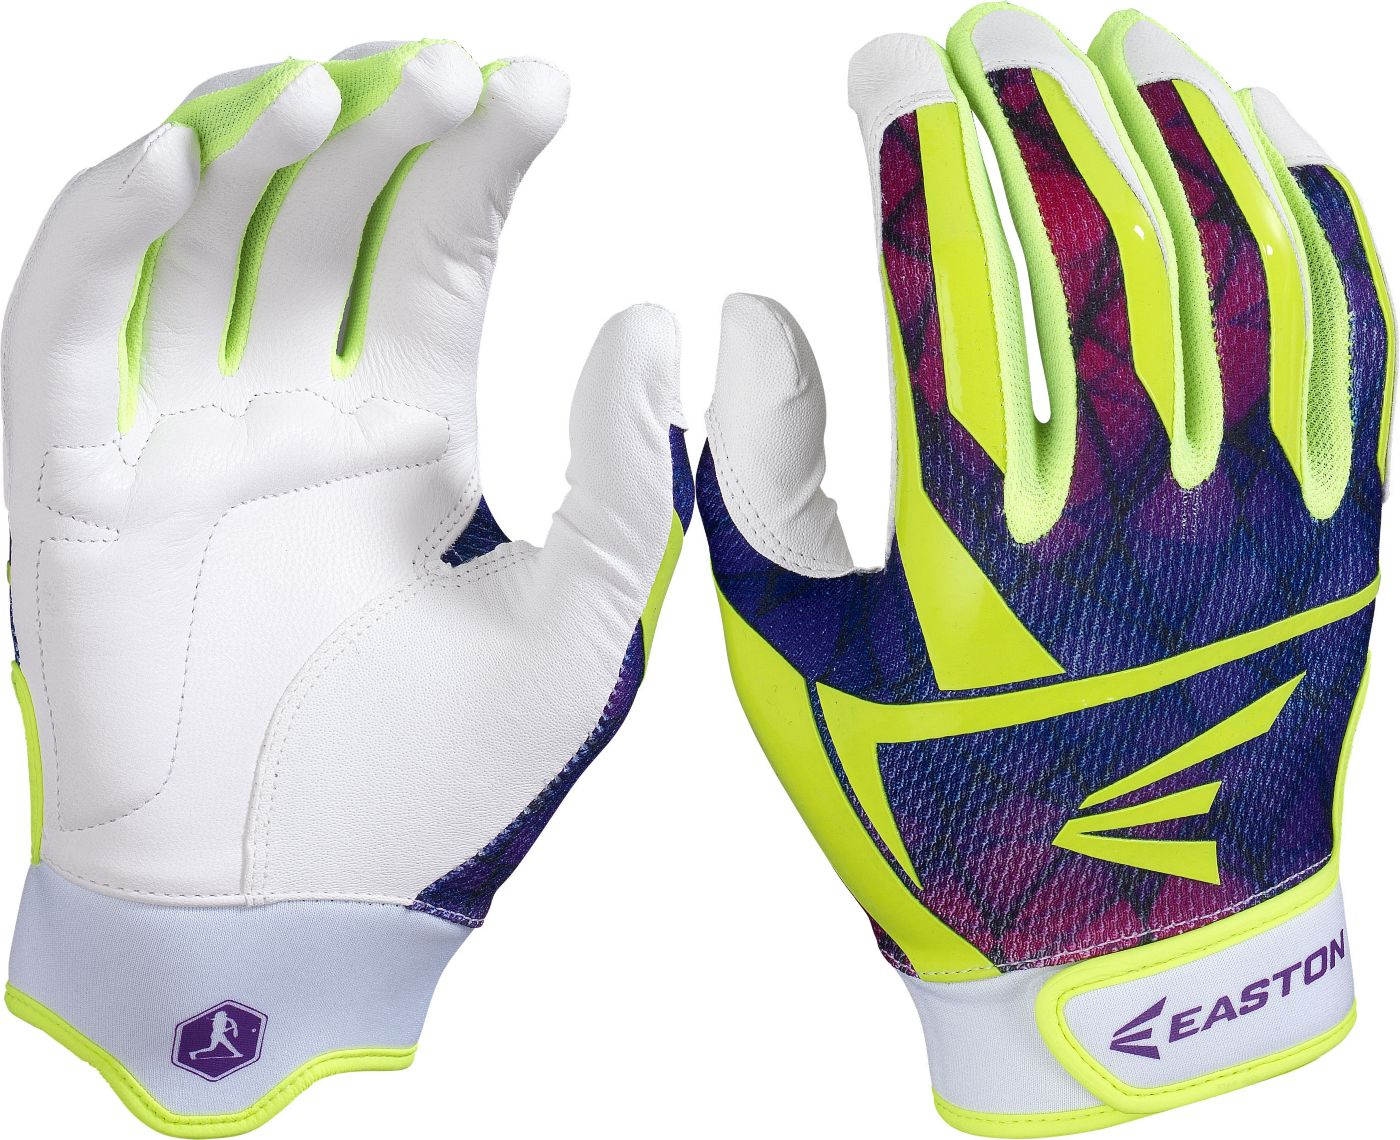 Easton Women's Prowess Batting Gloves